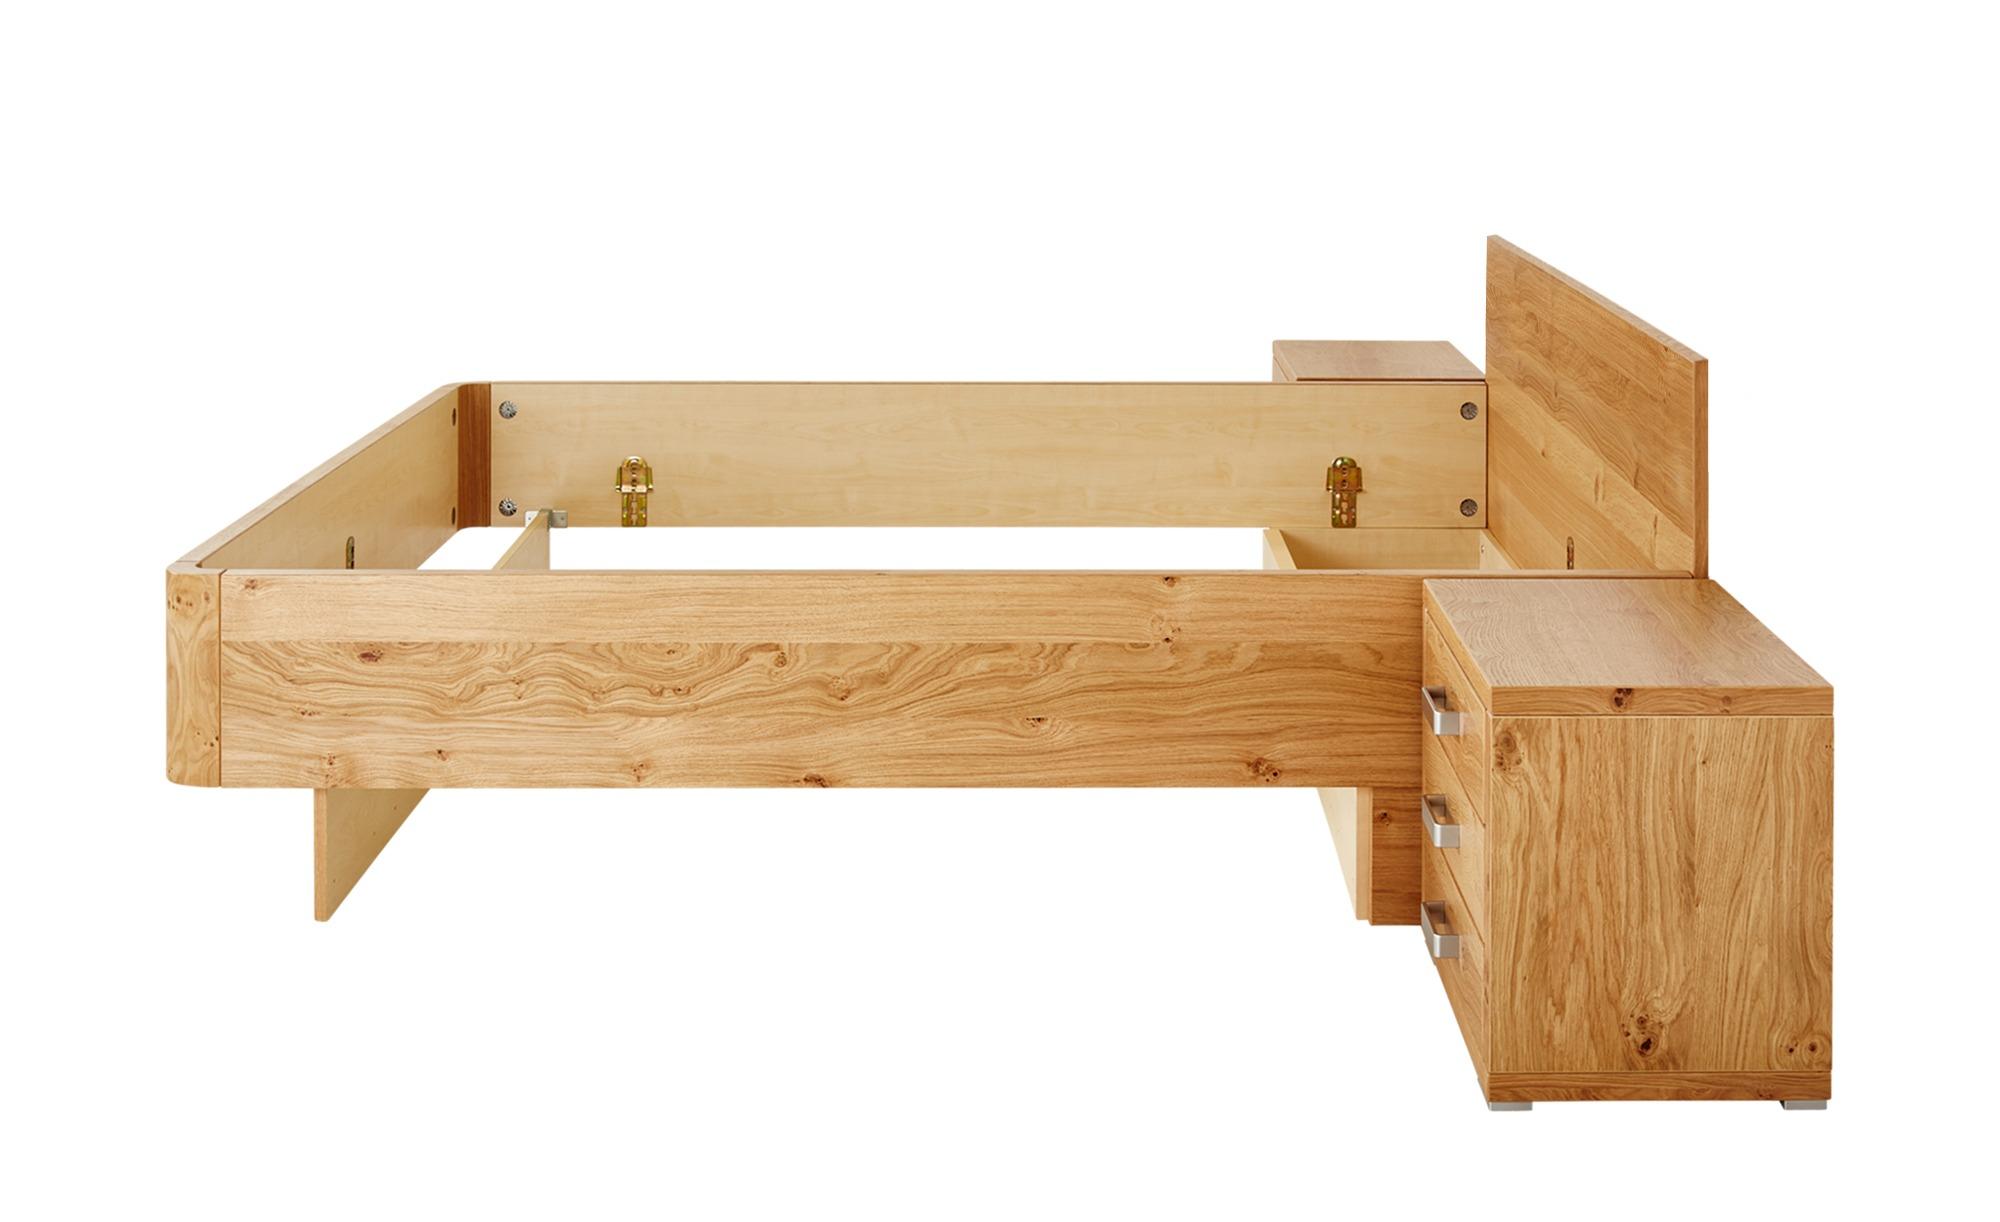 Full Size of Wohnwert Betten Dormian Erfahrungen Artone Nolte Aus Holz 90x200 Bei Ikea Flexa 100x200 Kopfteile Für überlänge Jugend Japanische Rauch 180x200 Günstige Bett Wohnwert Betten